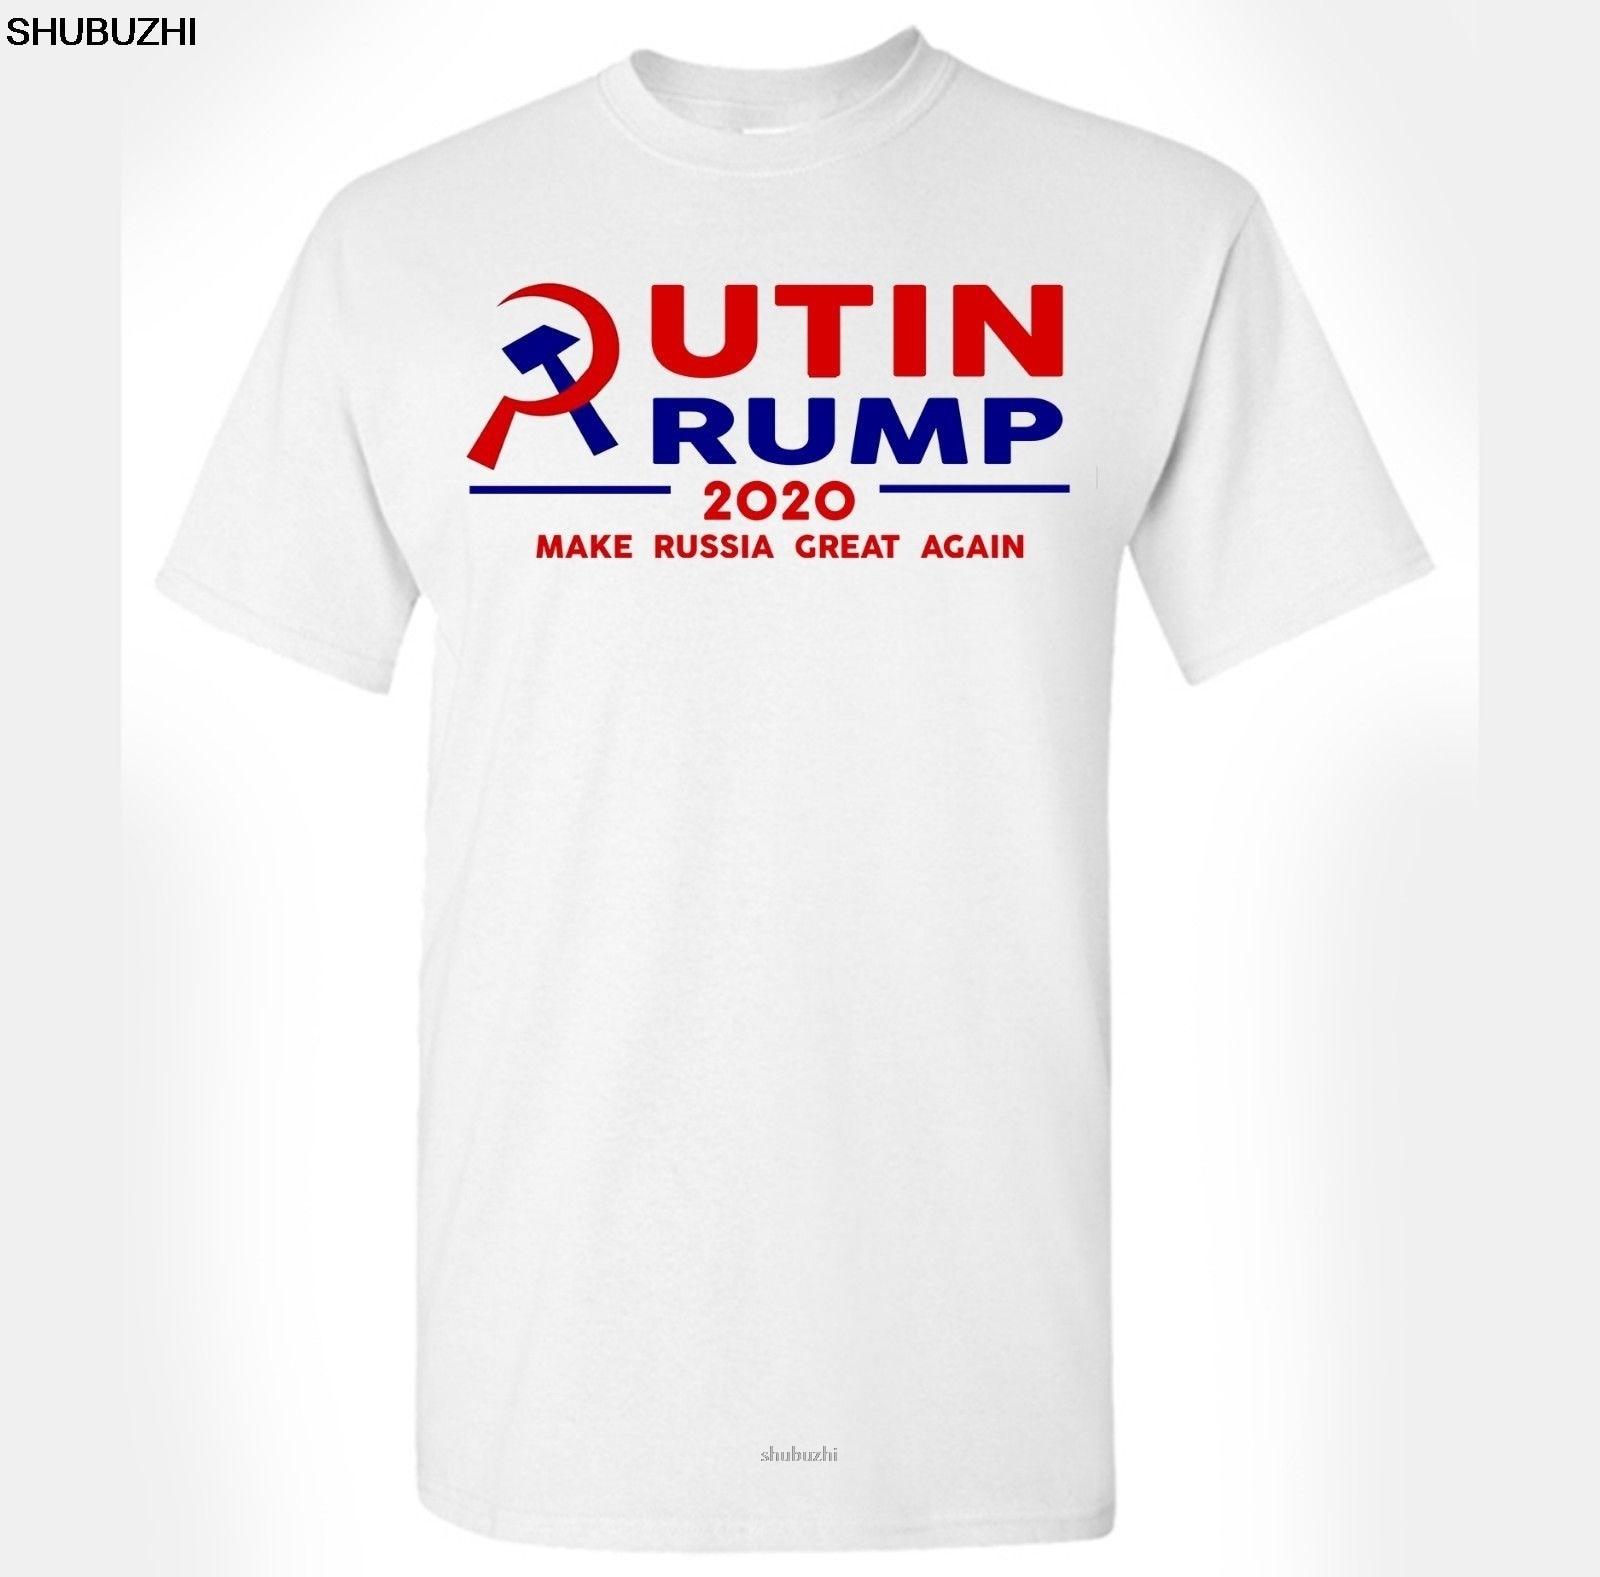 Donald Trump T-Shirt Make Russia Great Again Anti-President Putin Impeach Funny